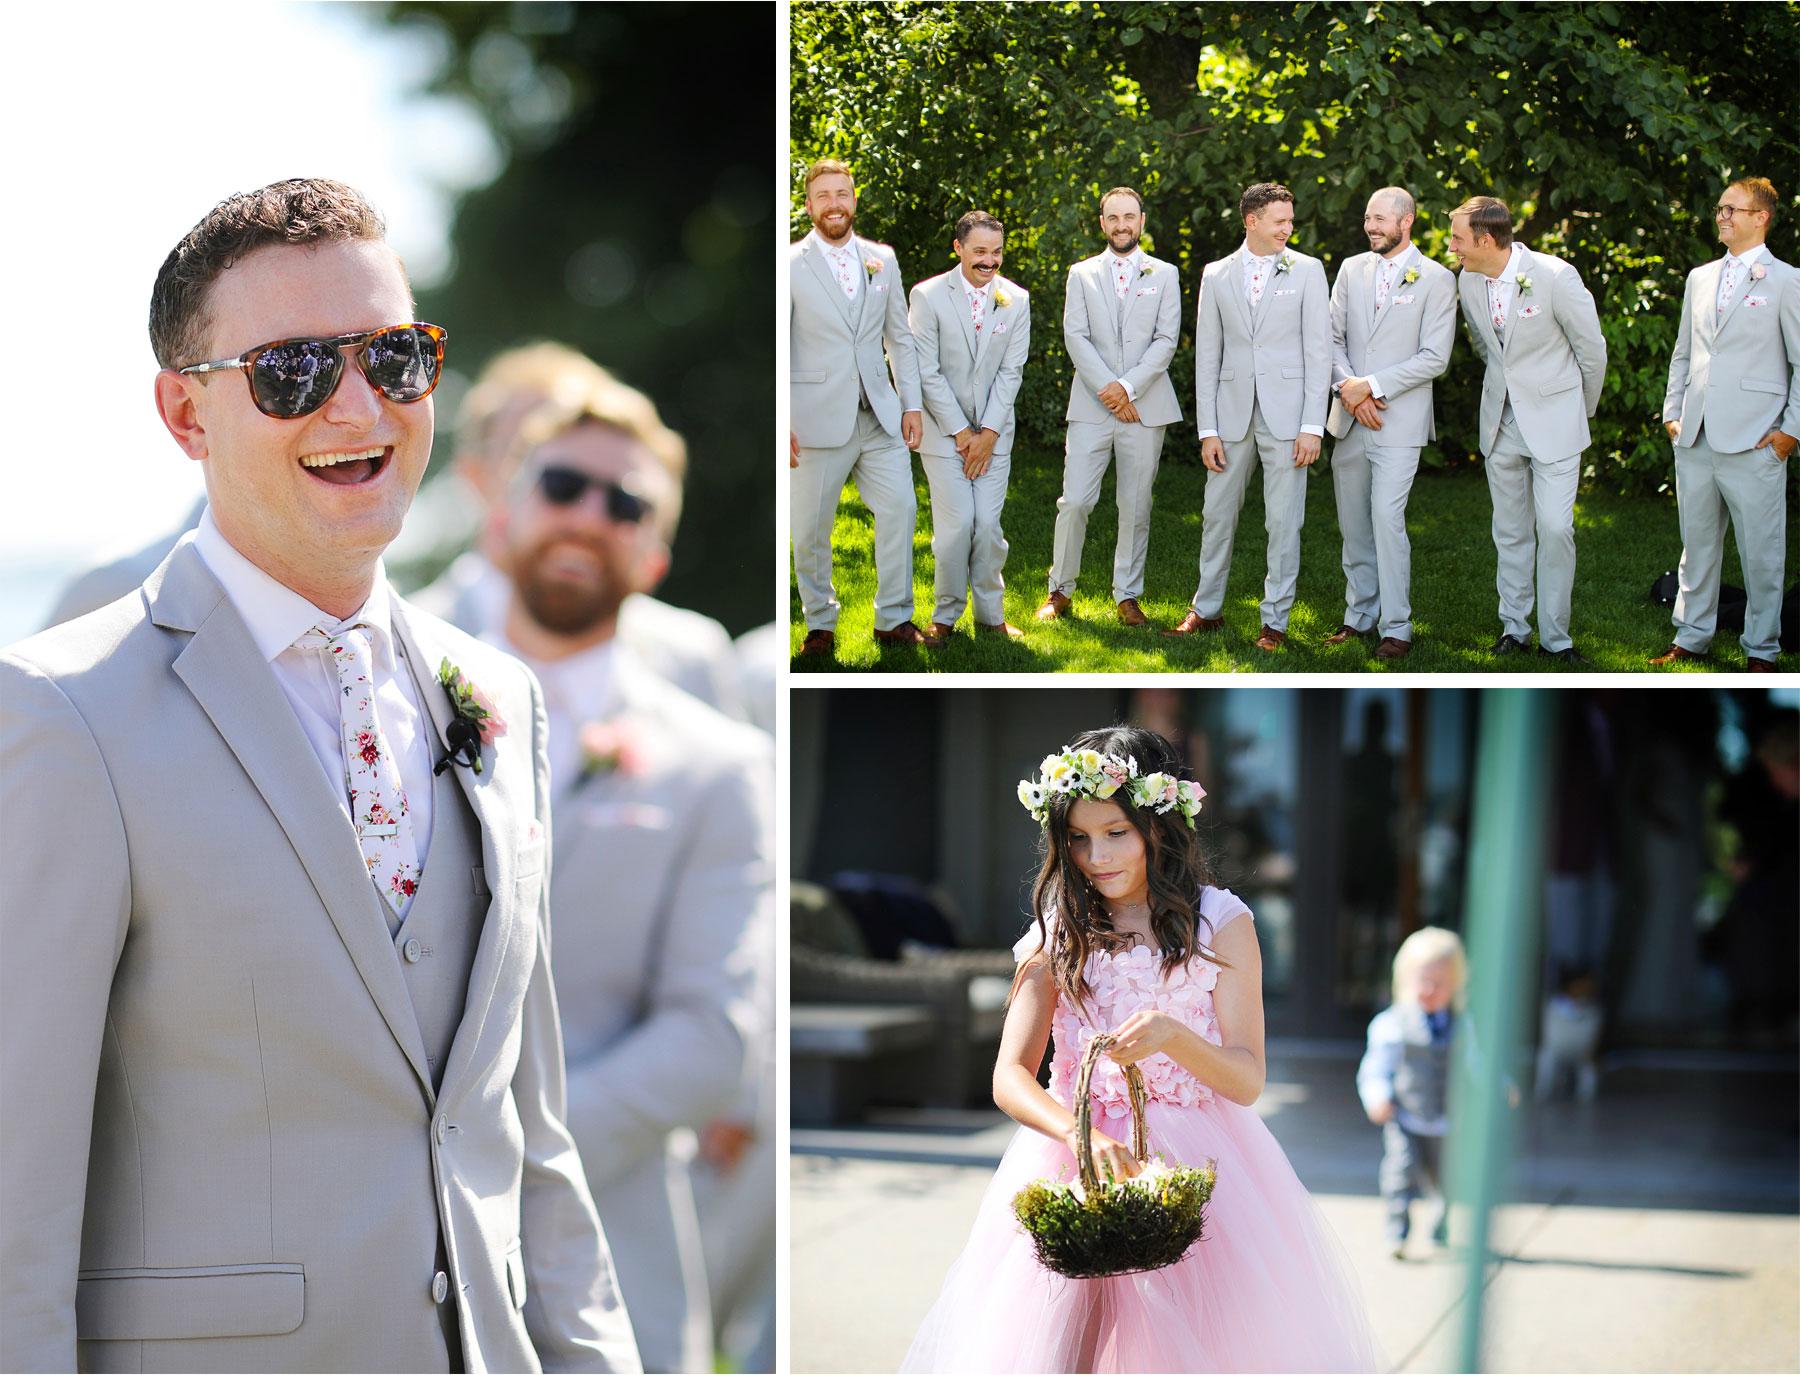 09-Vick-Photography-Wedding-Ottertail-Minnesota-Alice-in-Wonderland-Theme-Groom-Groomsmen-Flowergirl-Tess-and-Greg.jpg